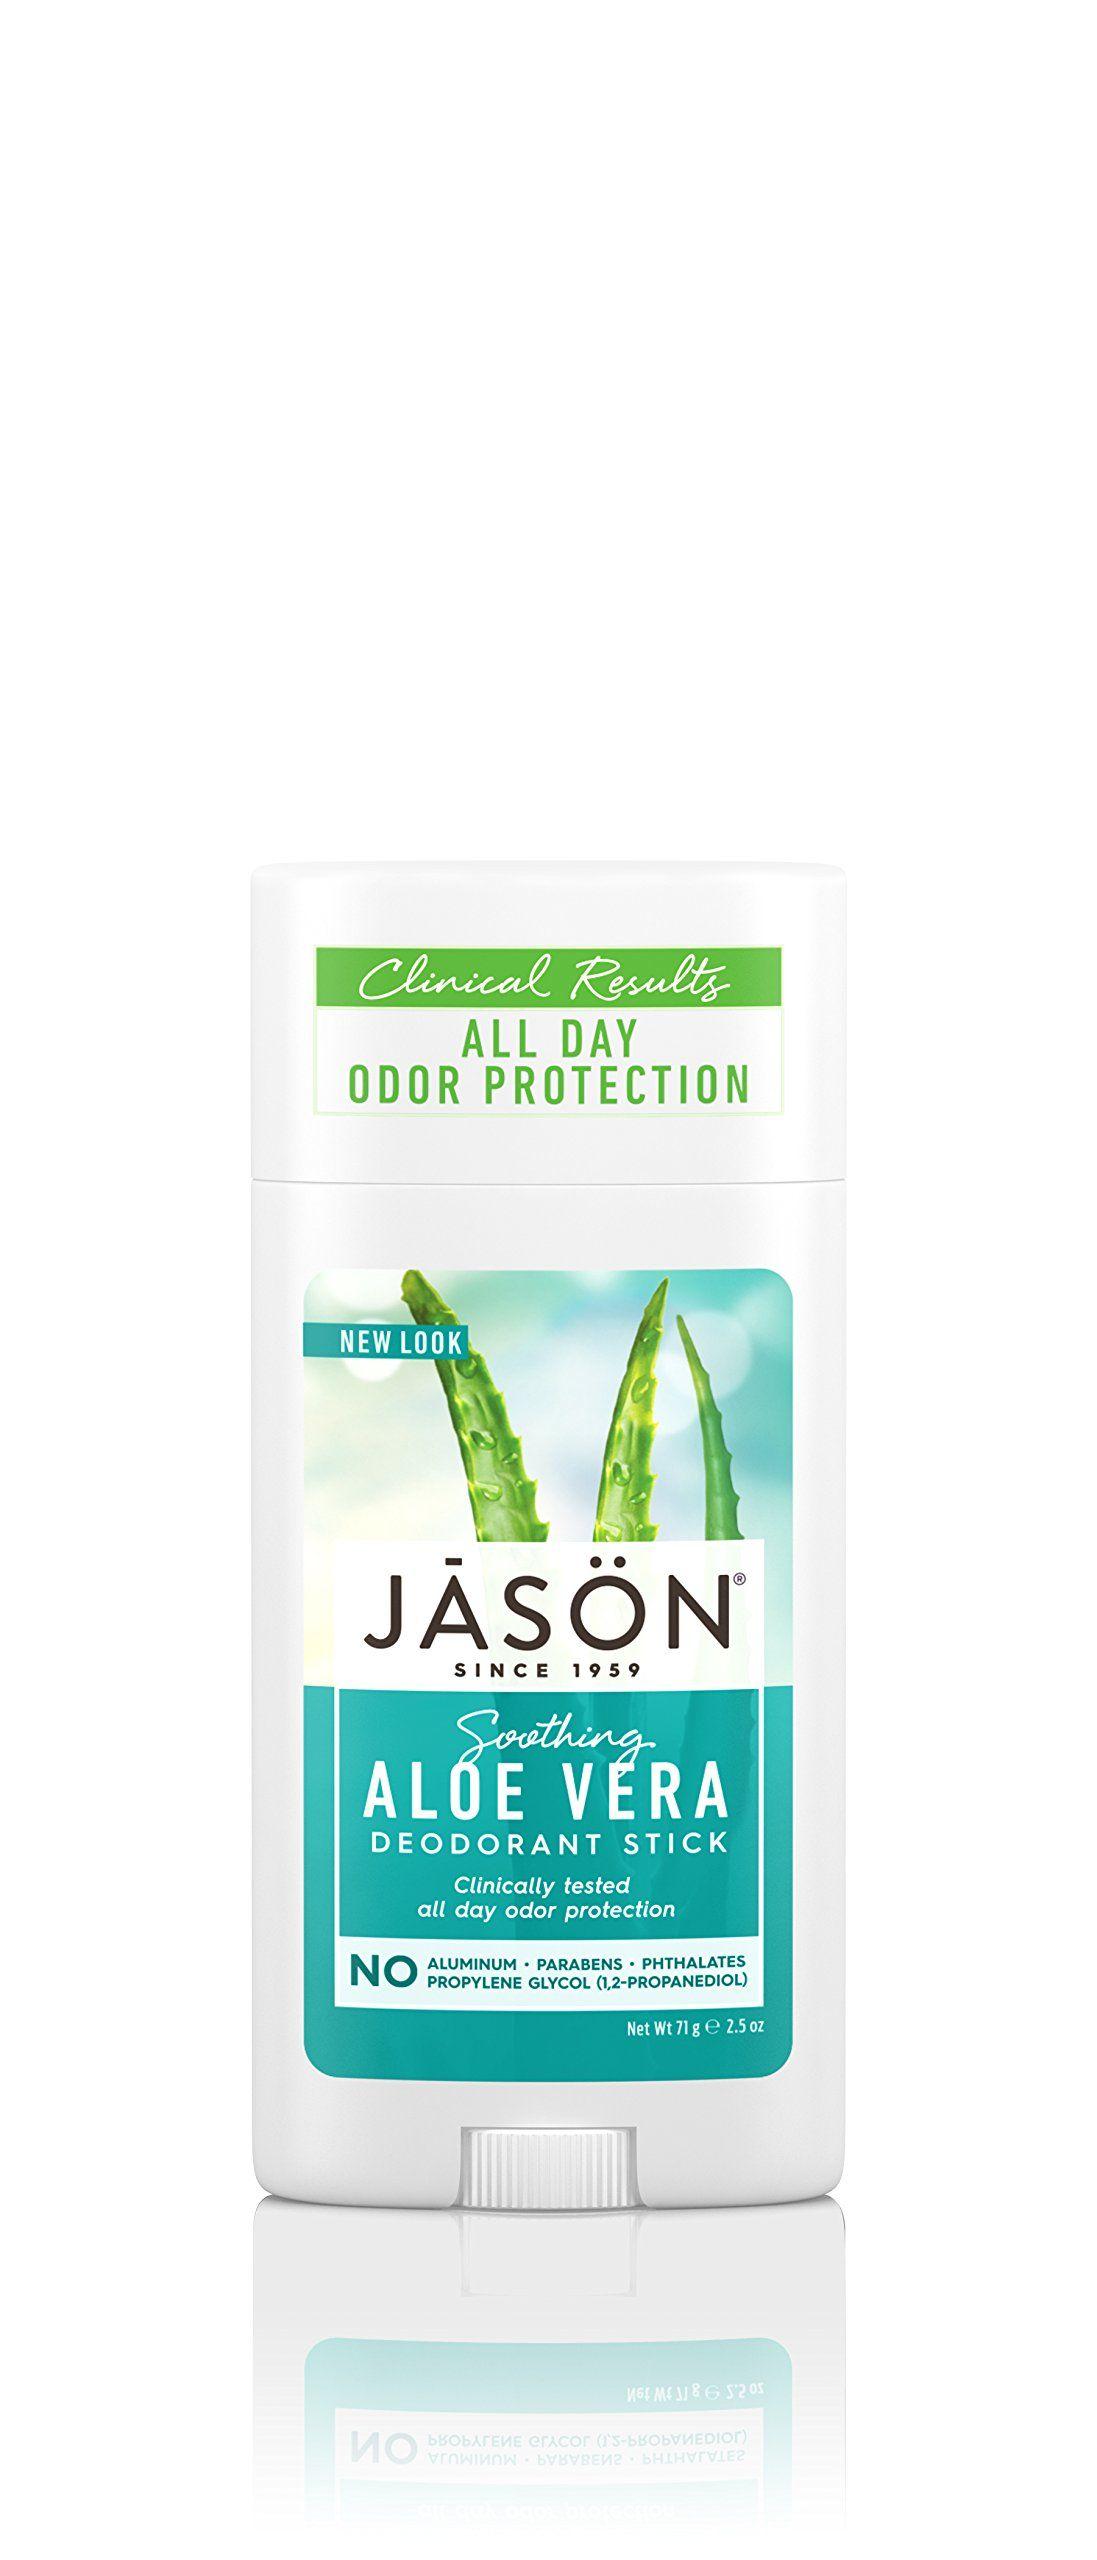 Jason soothing aloe vera aluminum and paraben free